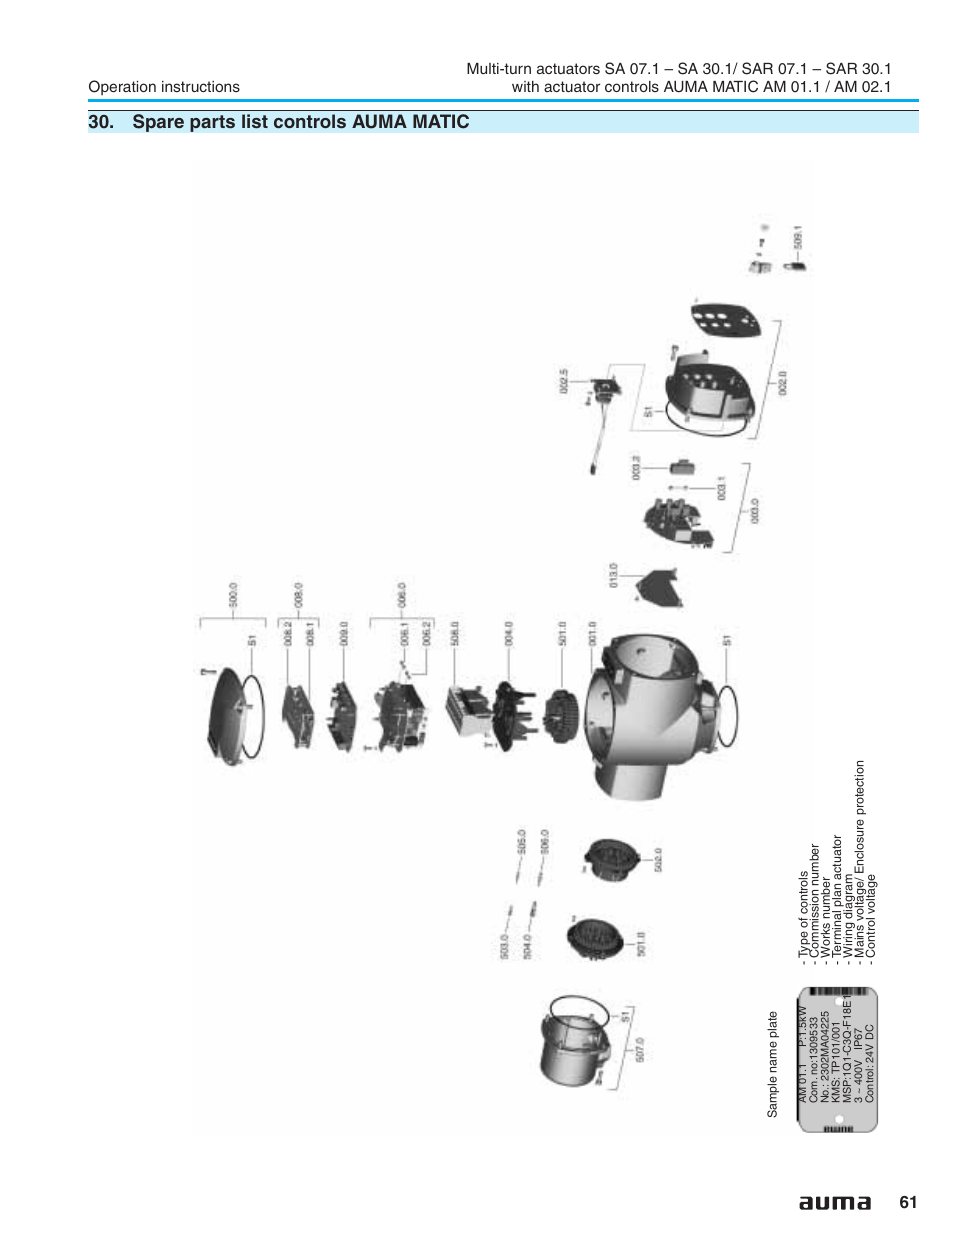 auma electric multi turn actuators sa 071 161_sar 071 161 matic am 011 021 page61?resize=665%2C861 auma model sa wiring diagram bettis actuator diagrams, 2005 bettis actuator wiring diagrams at gsmportal.co